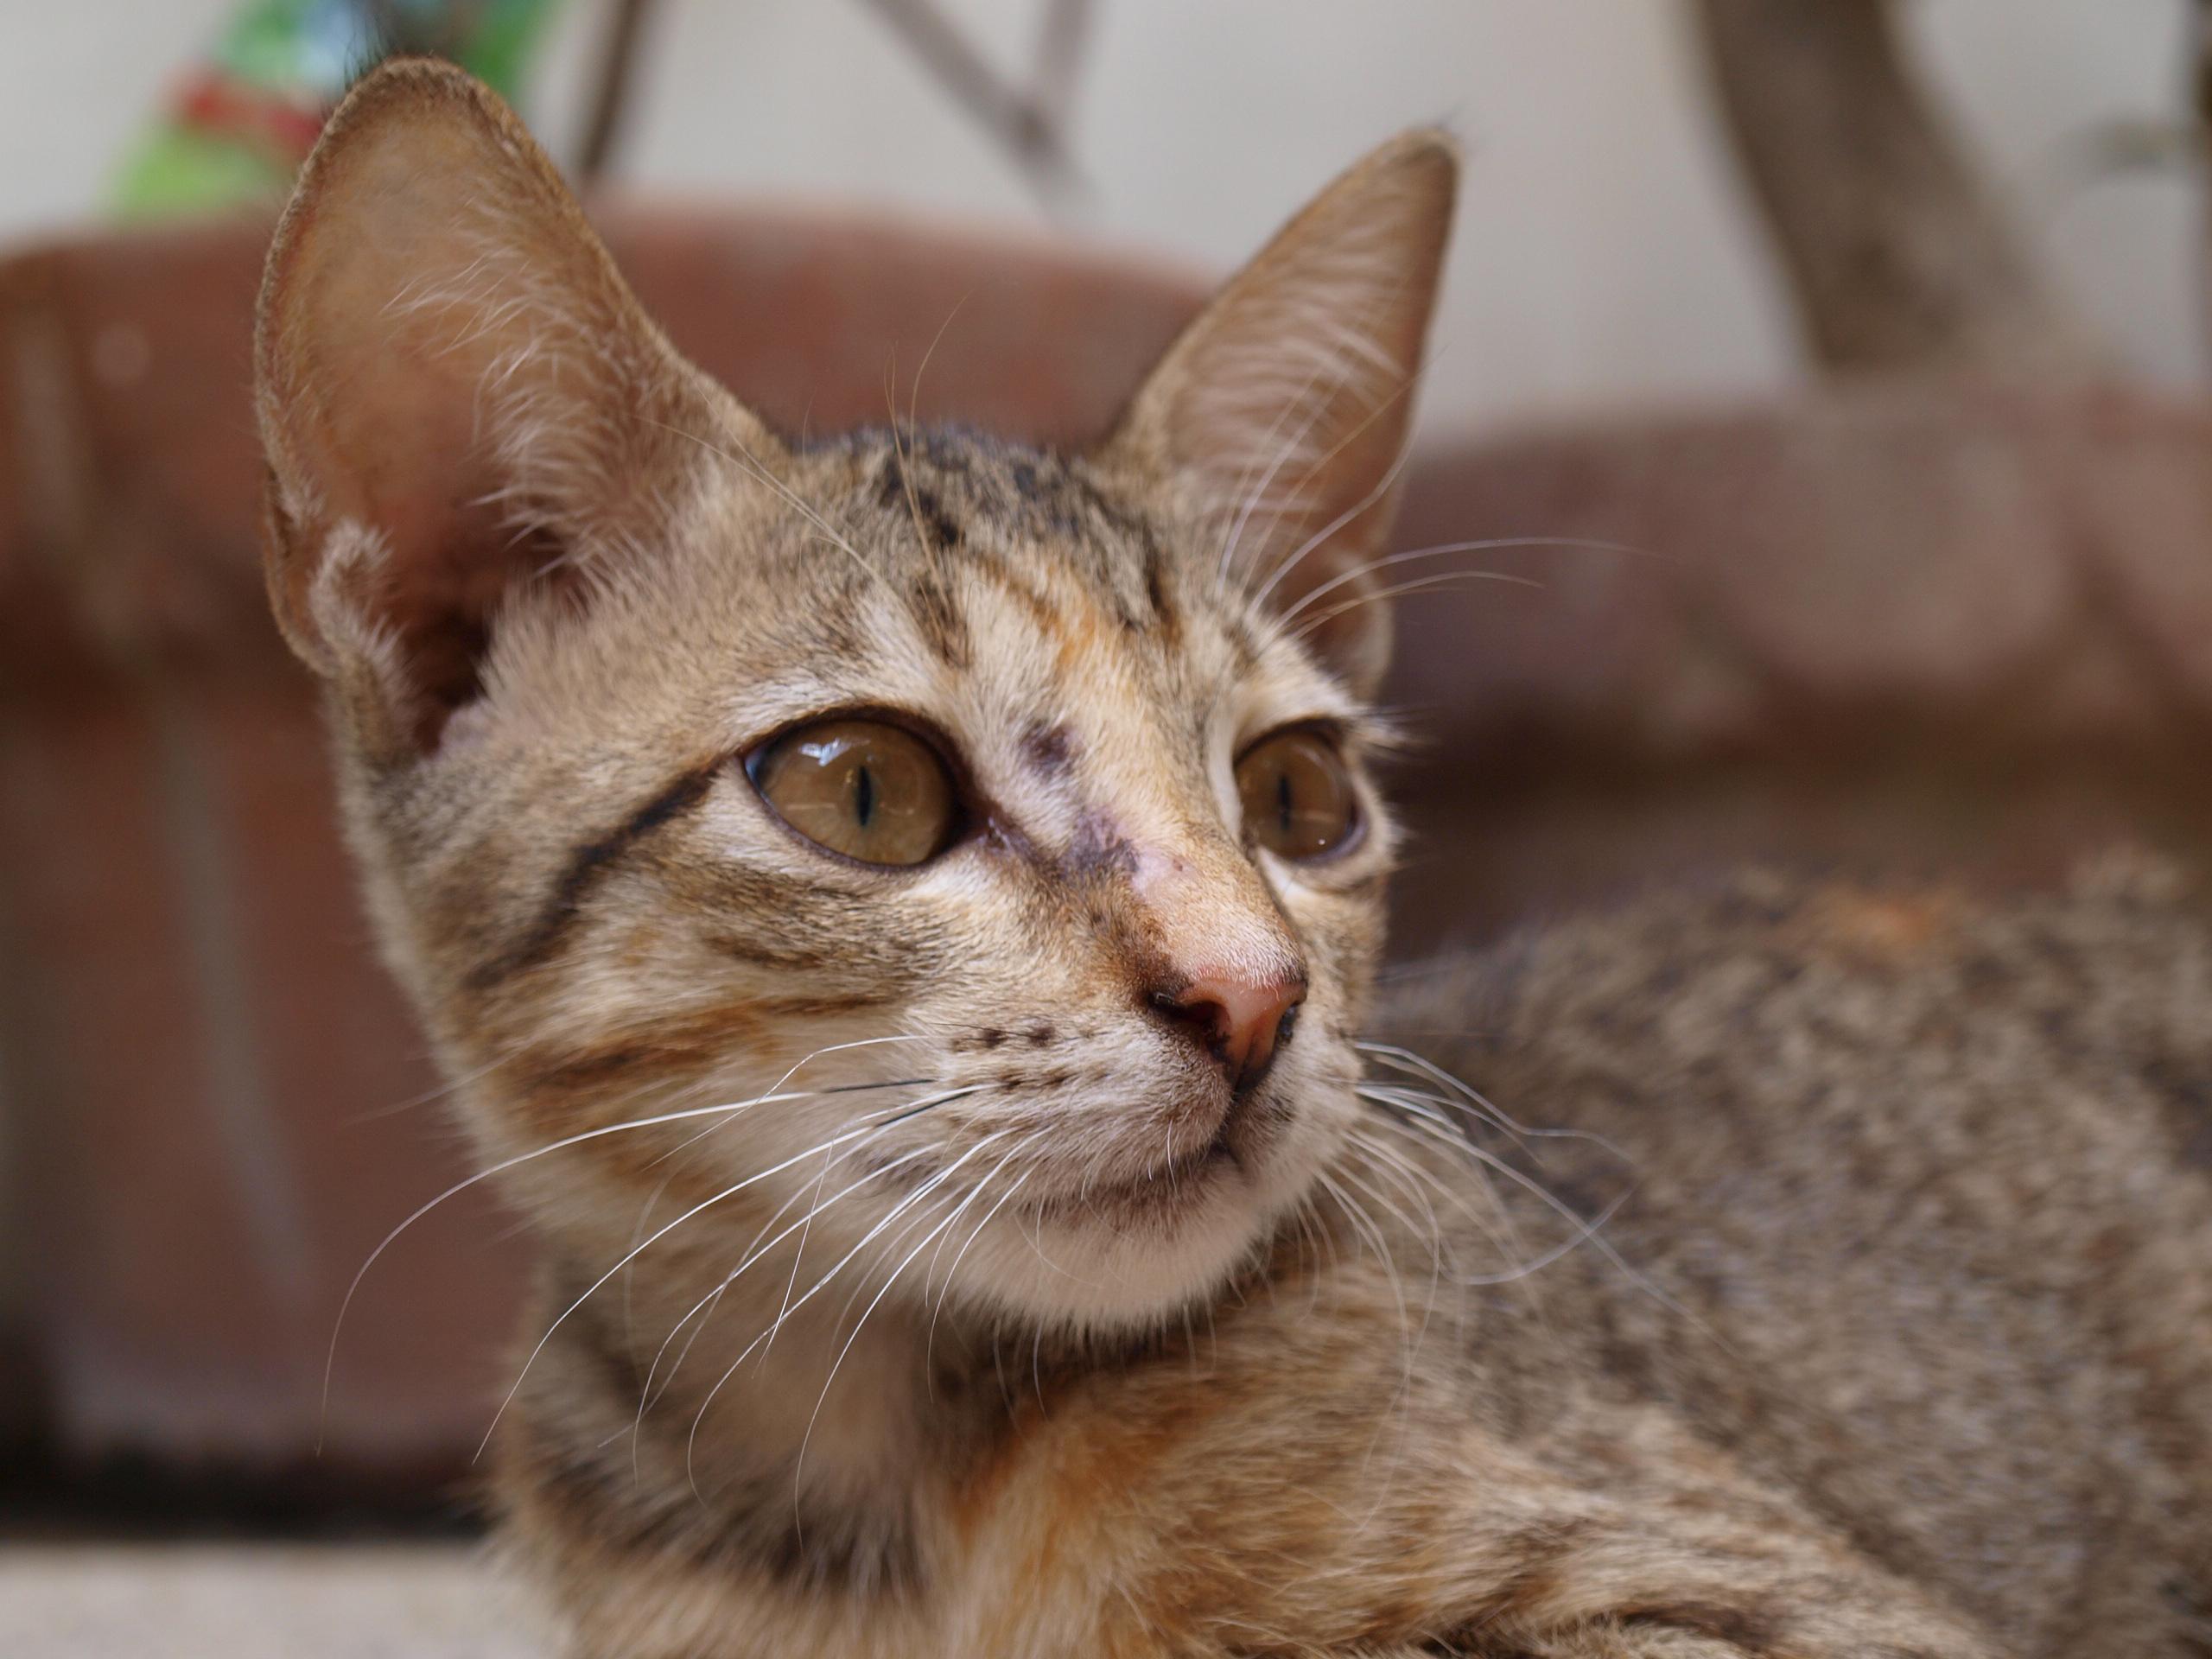 Cat closeup photo